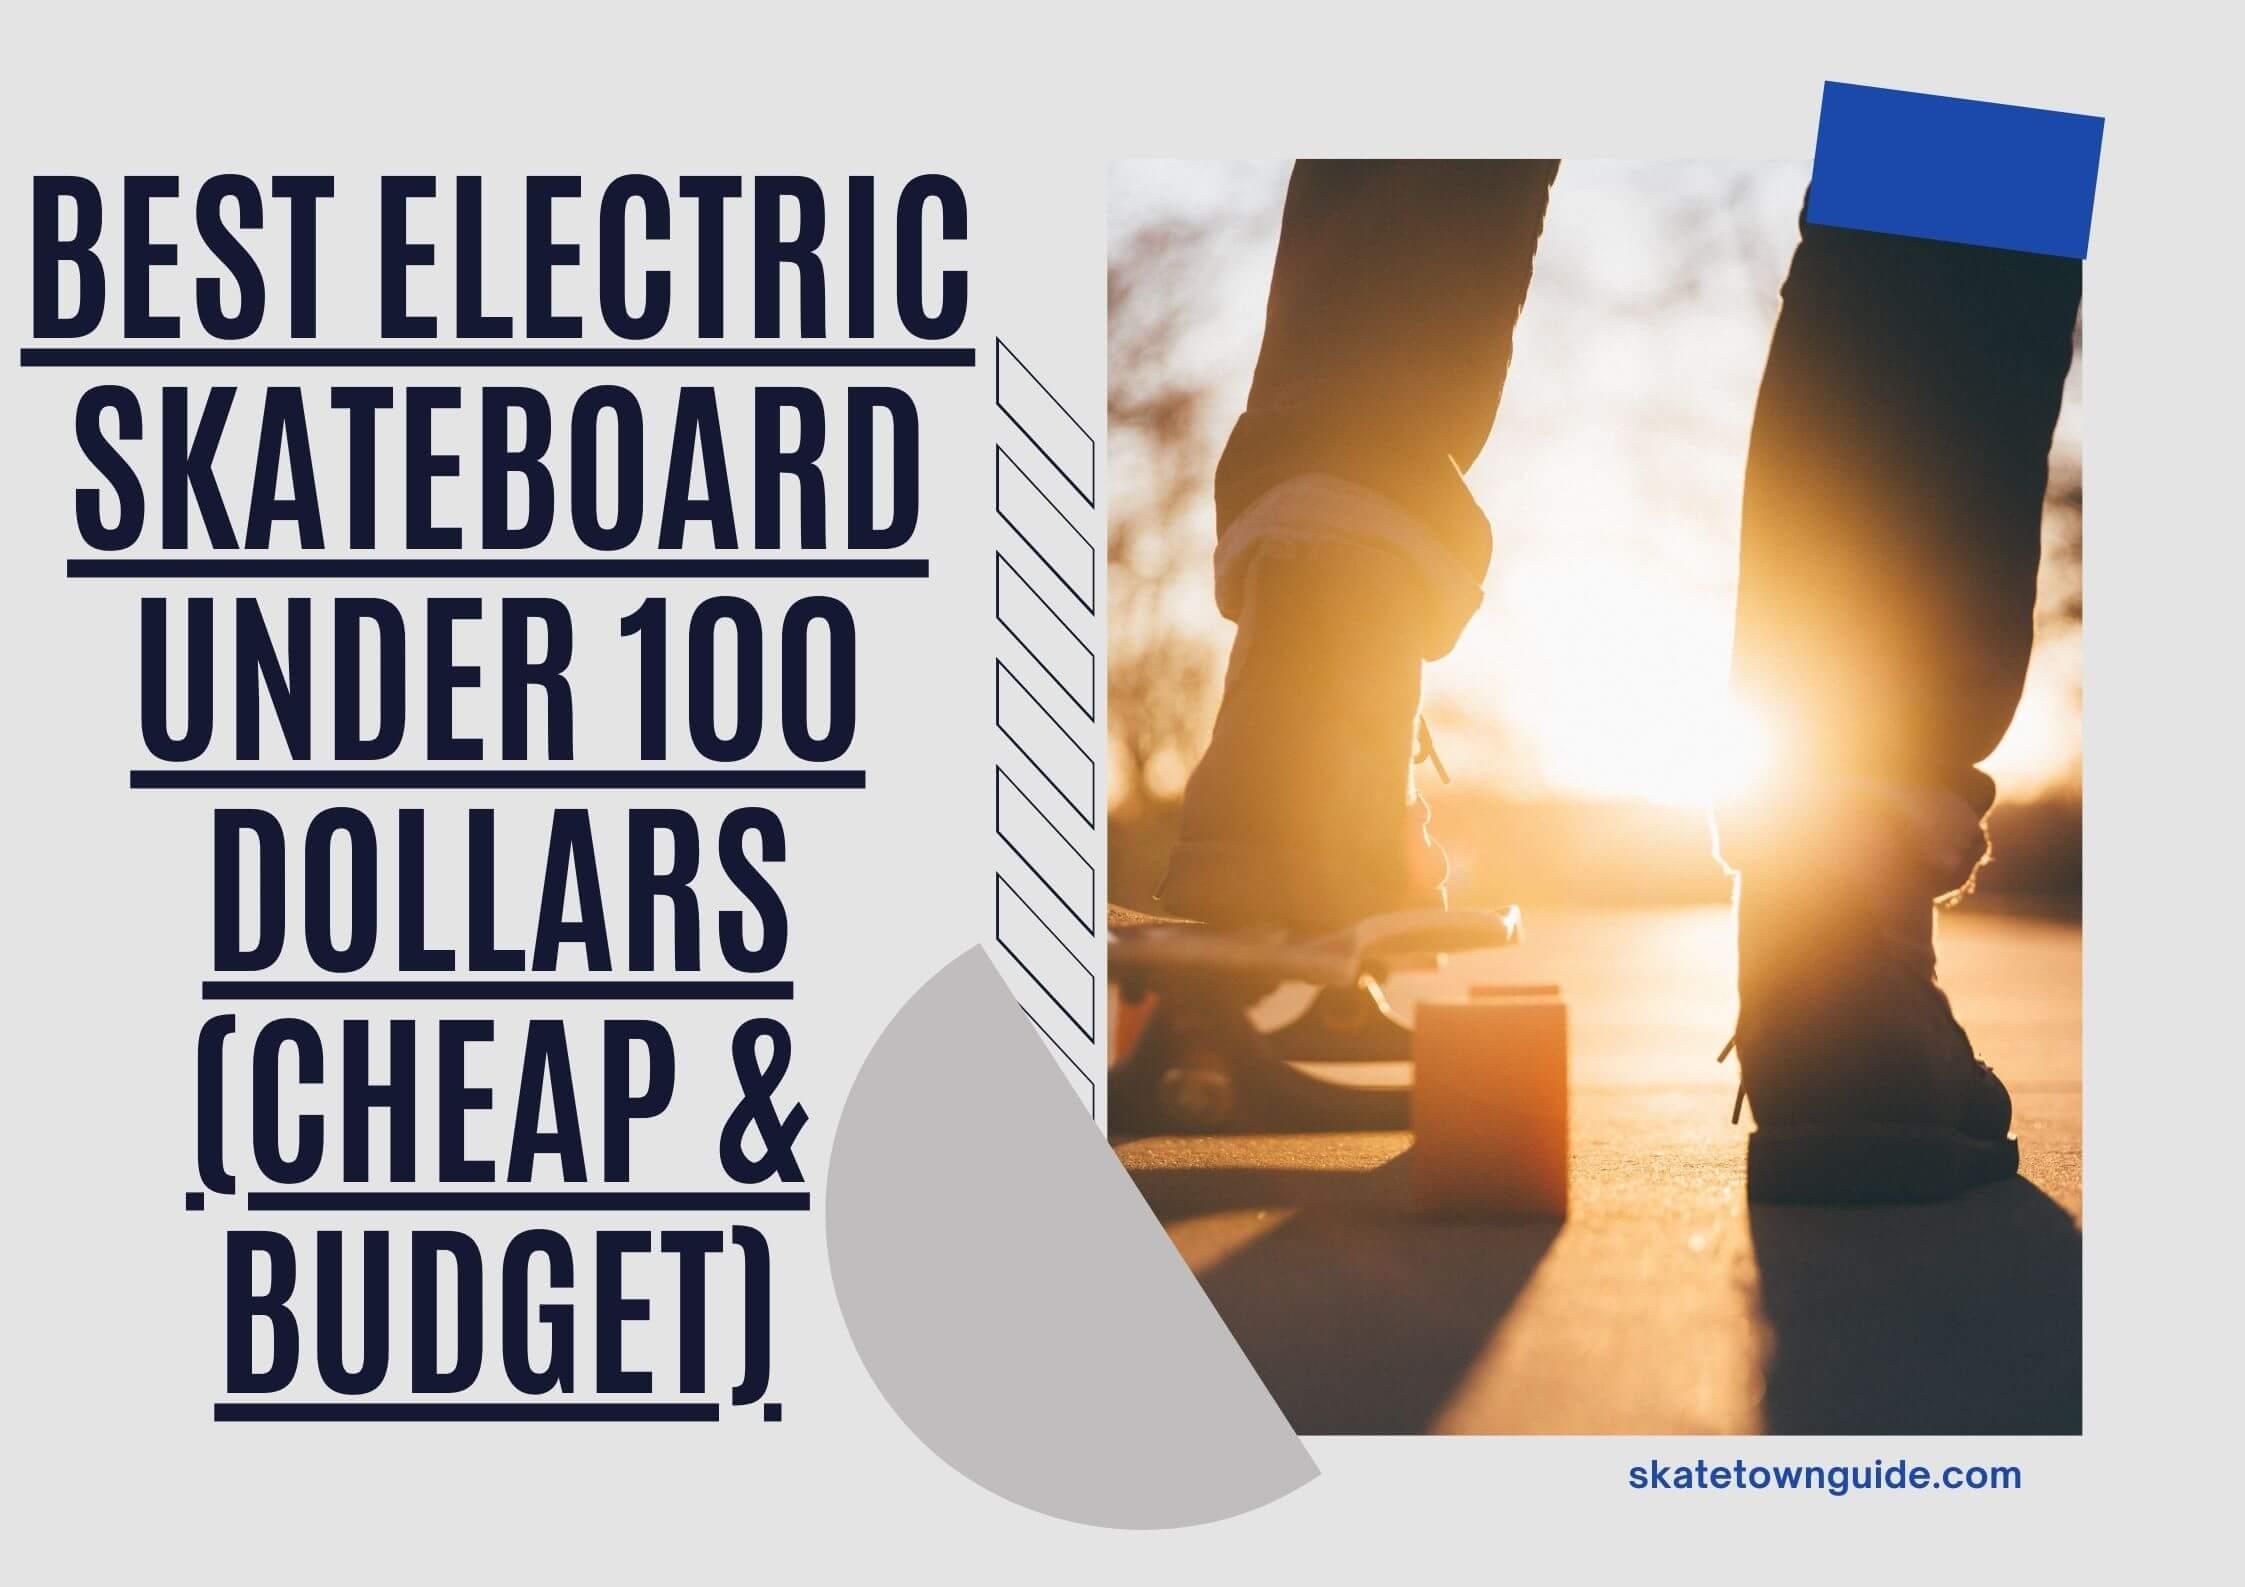 Top 9 Best Electric Skateboard Under 100 Dollars (Cheap & Budget)